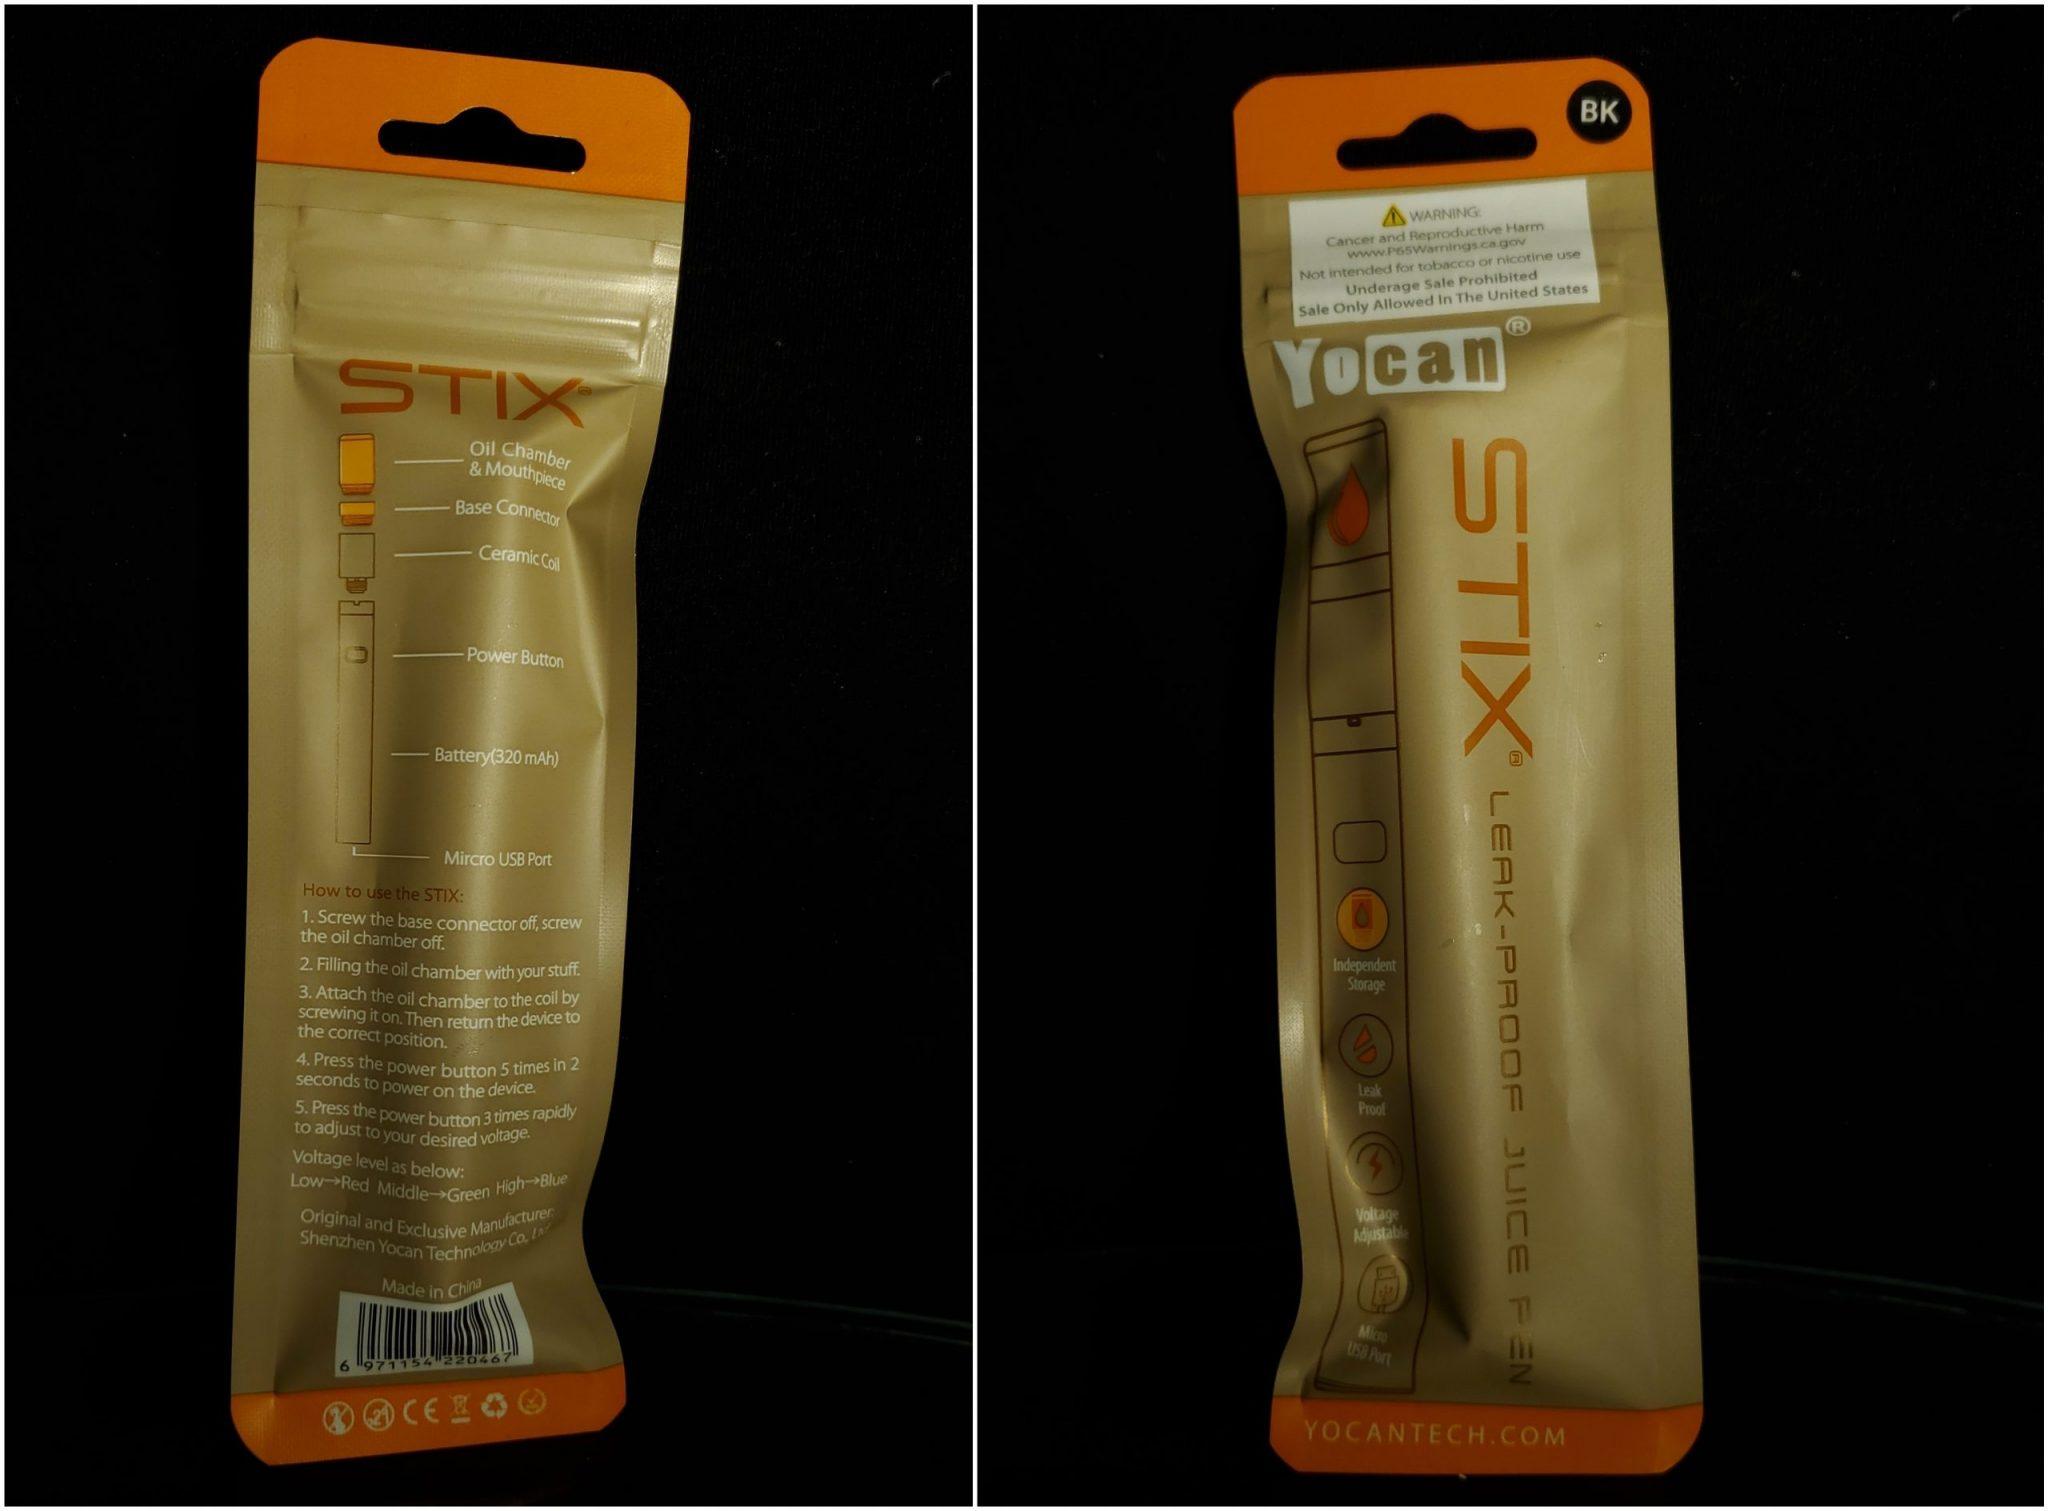 yocan stix pack